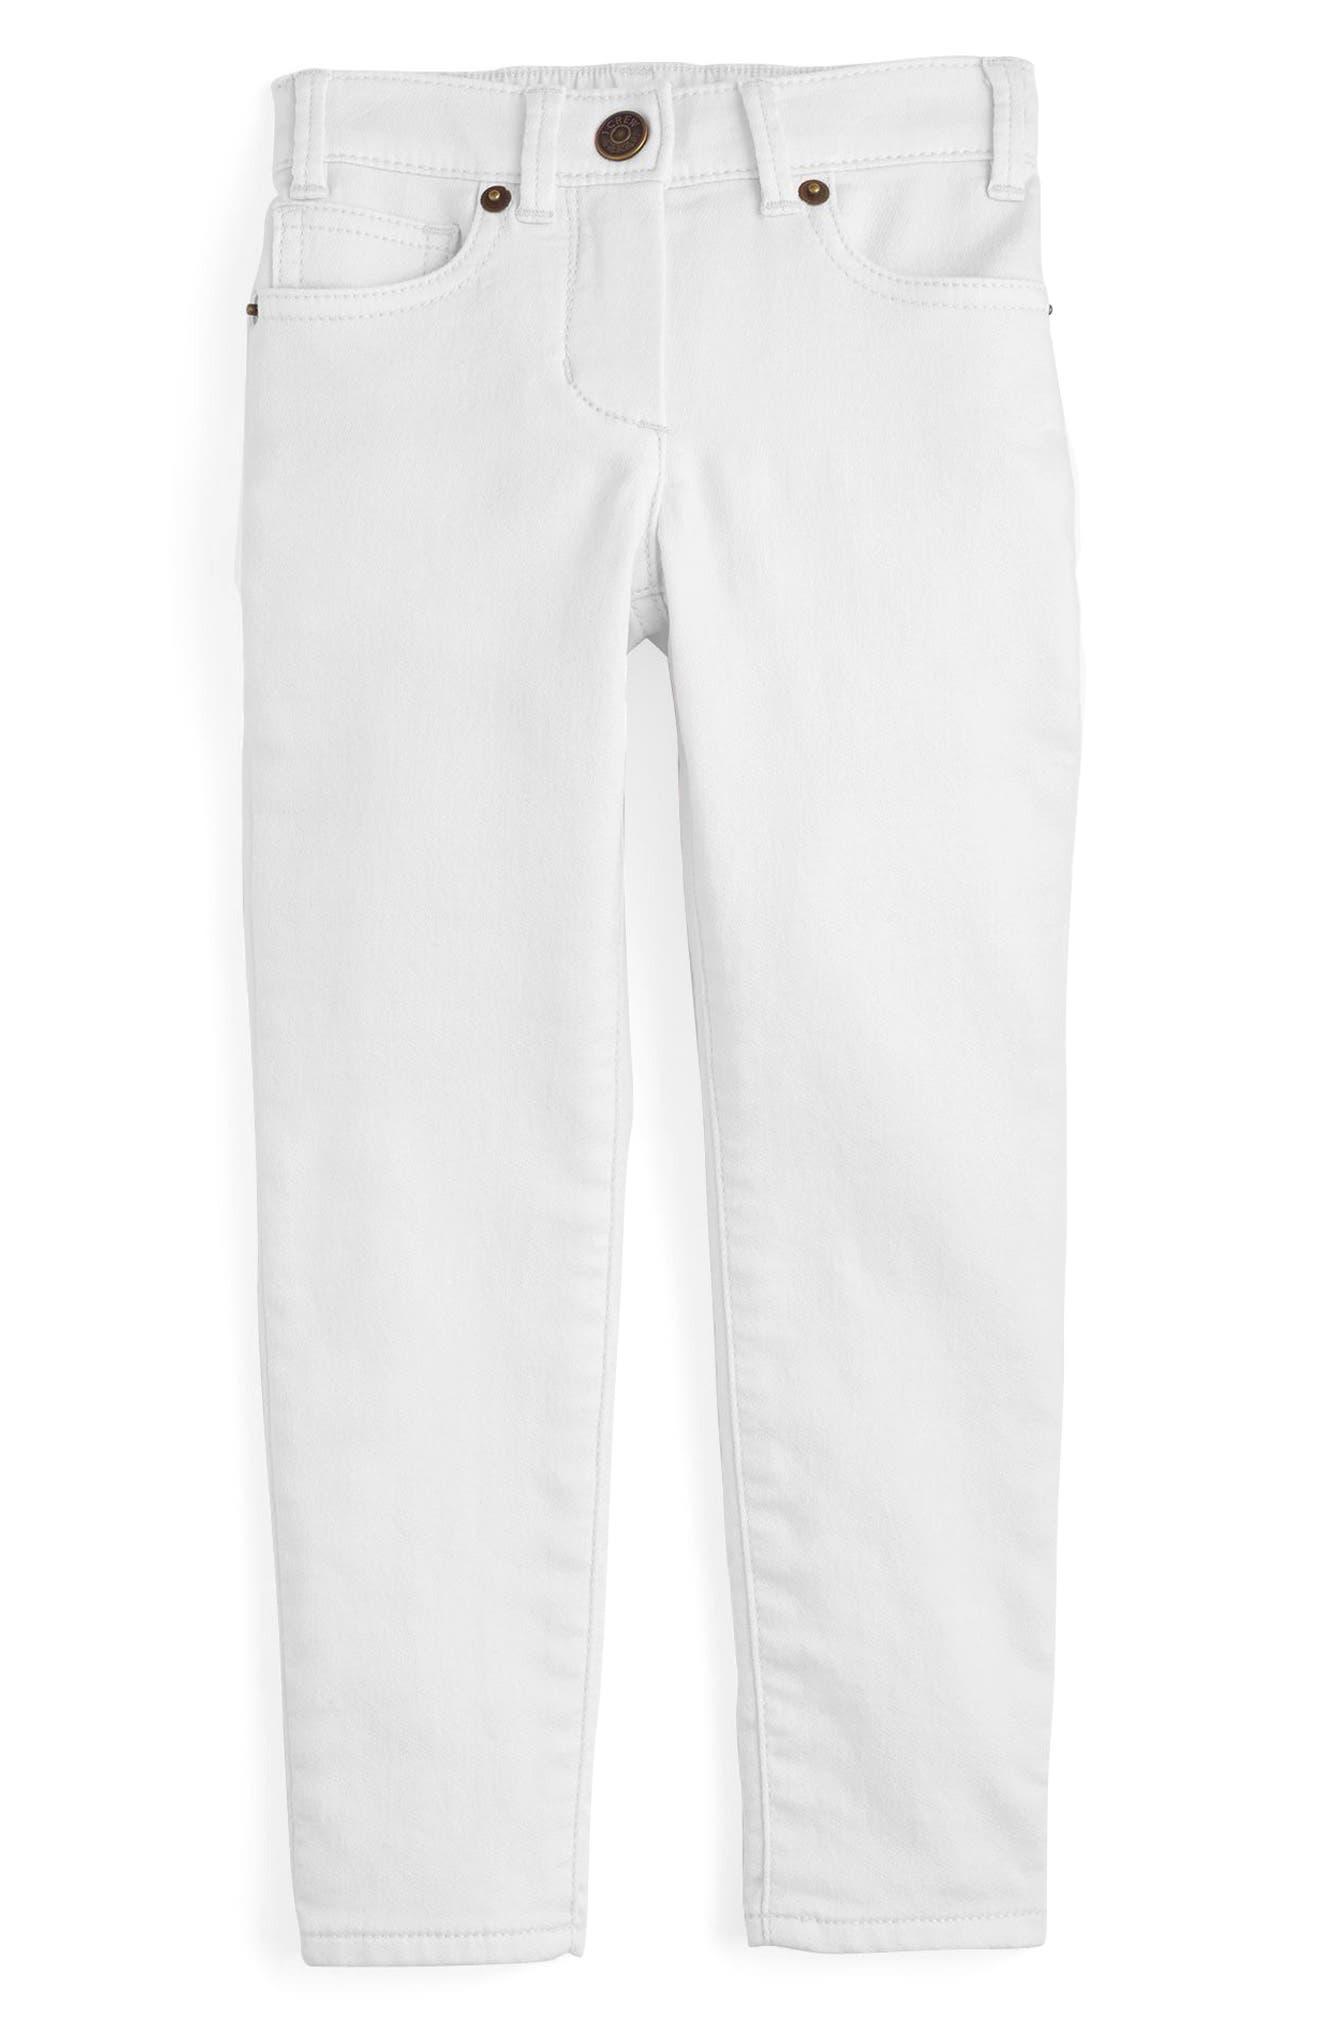 CREWCUTS BY J.CREW Runaround Garment Dye Jeans, Main, color, 101